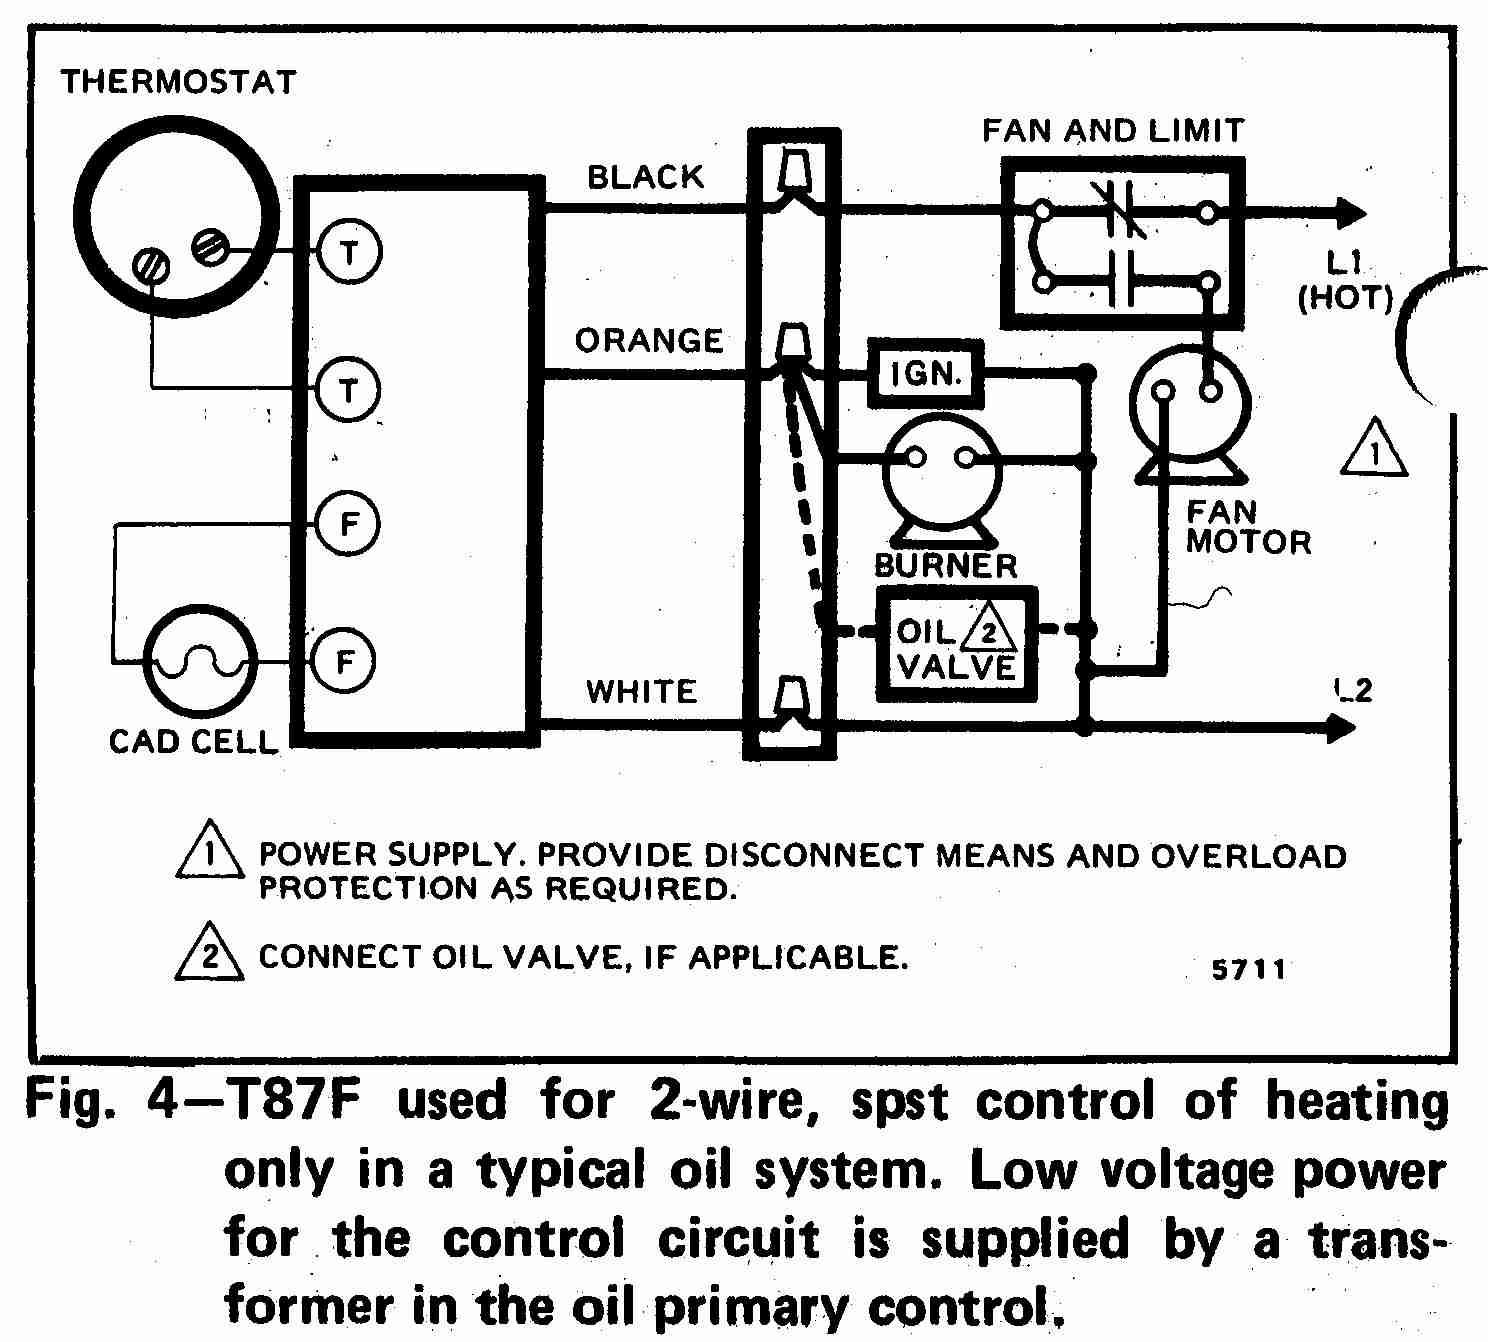 Diagram Duotherm Thermostat Wiring Diagram Full Version Hd Quality Wiring Diagram Printerdiagram Cefalubb It